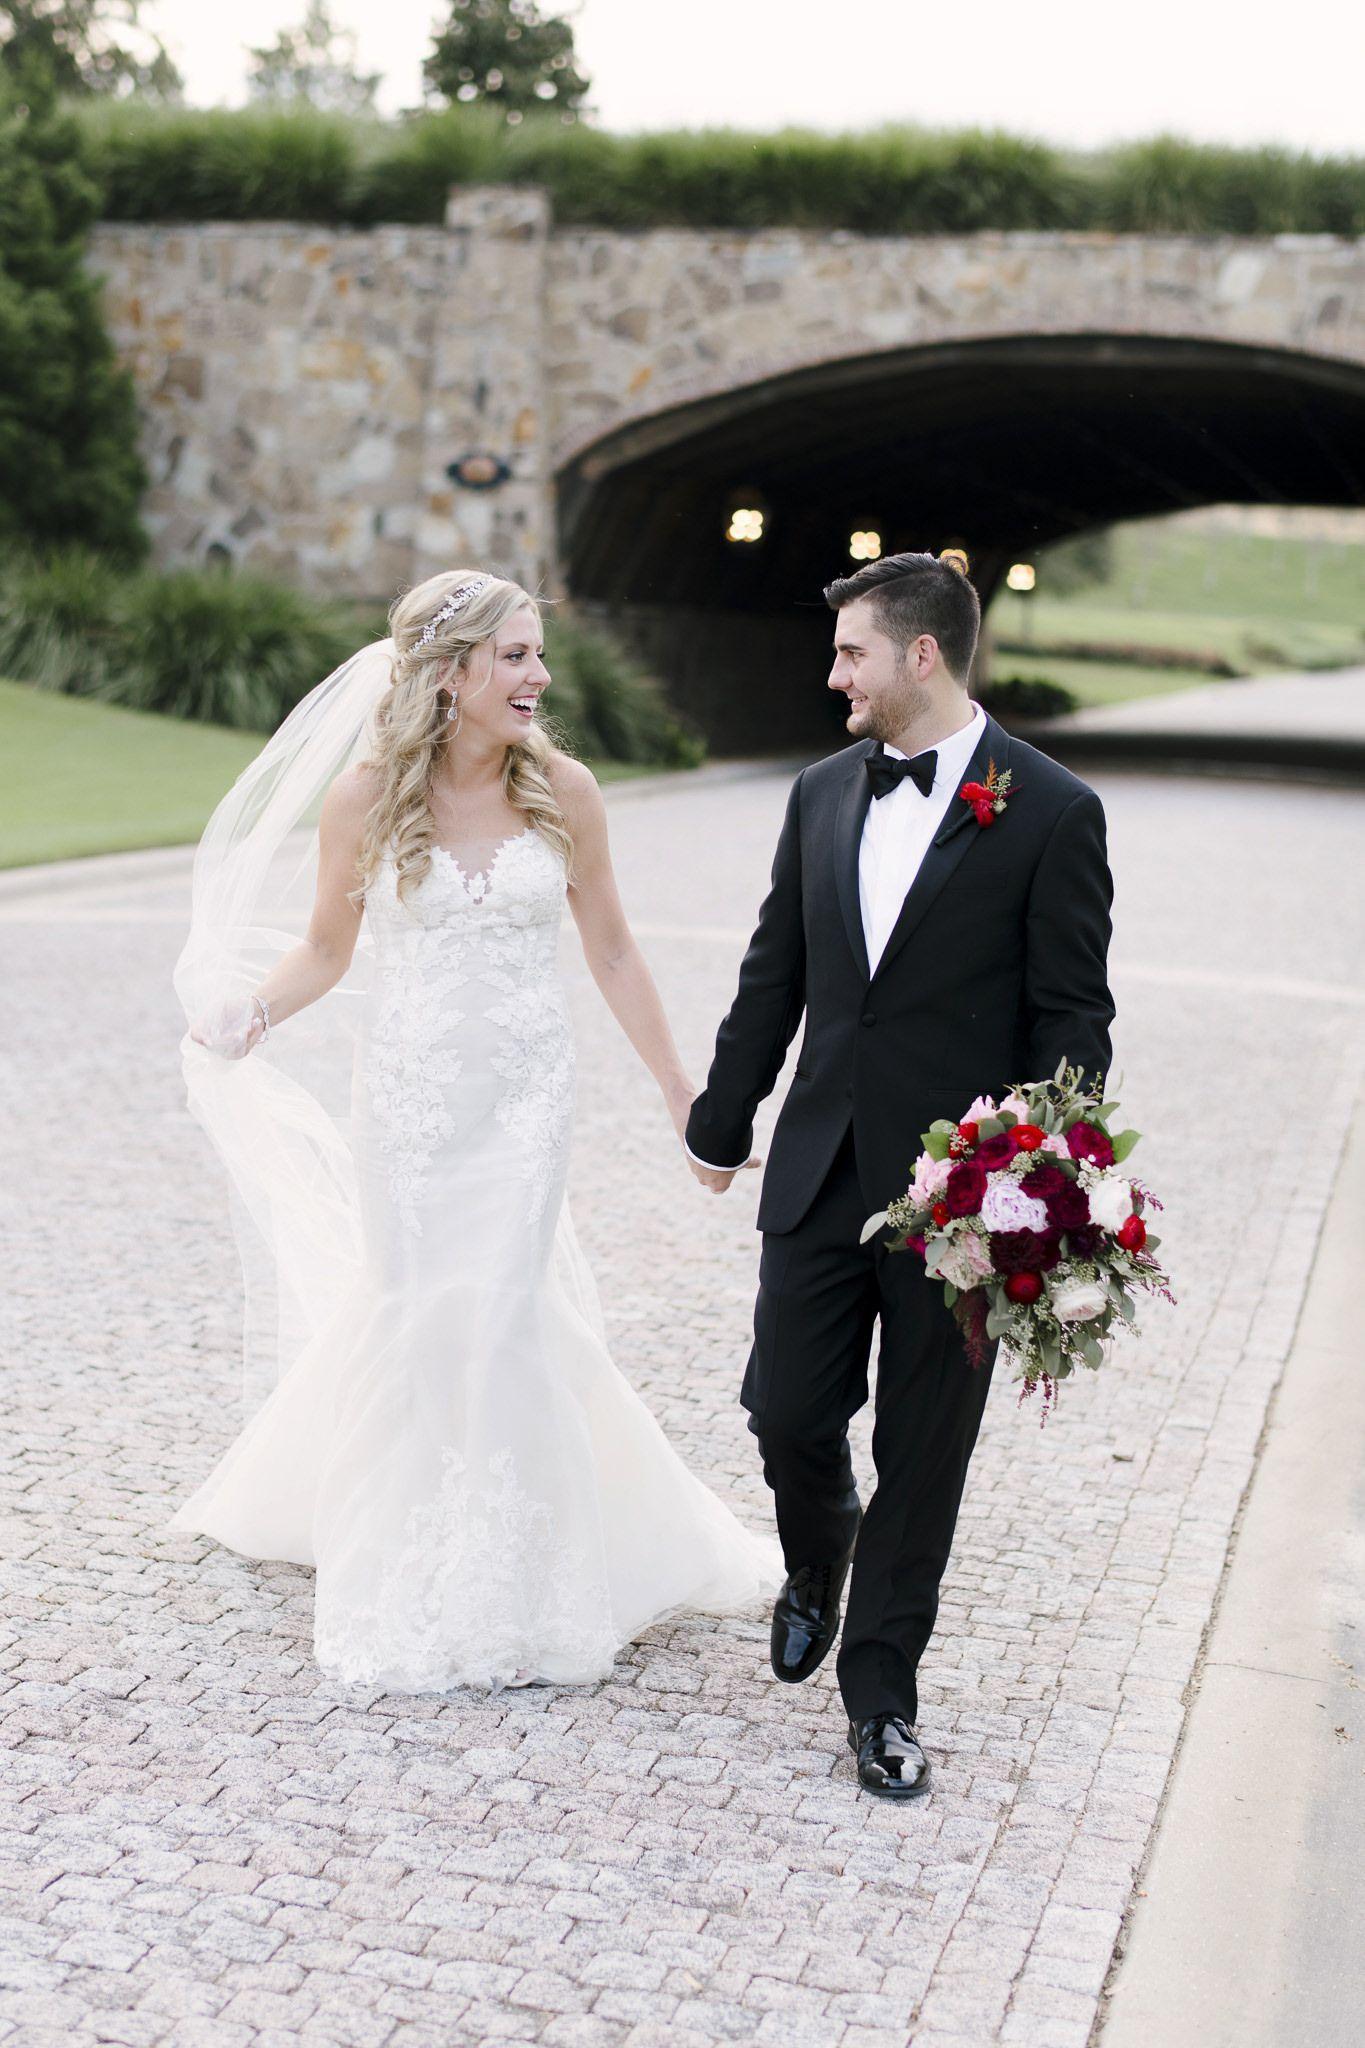 Taylor & Chris Lace weddings, Bella collina wedding, Wedding